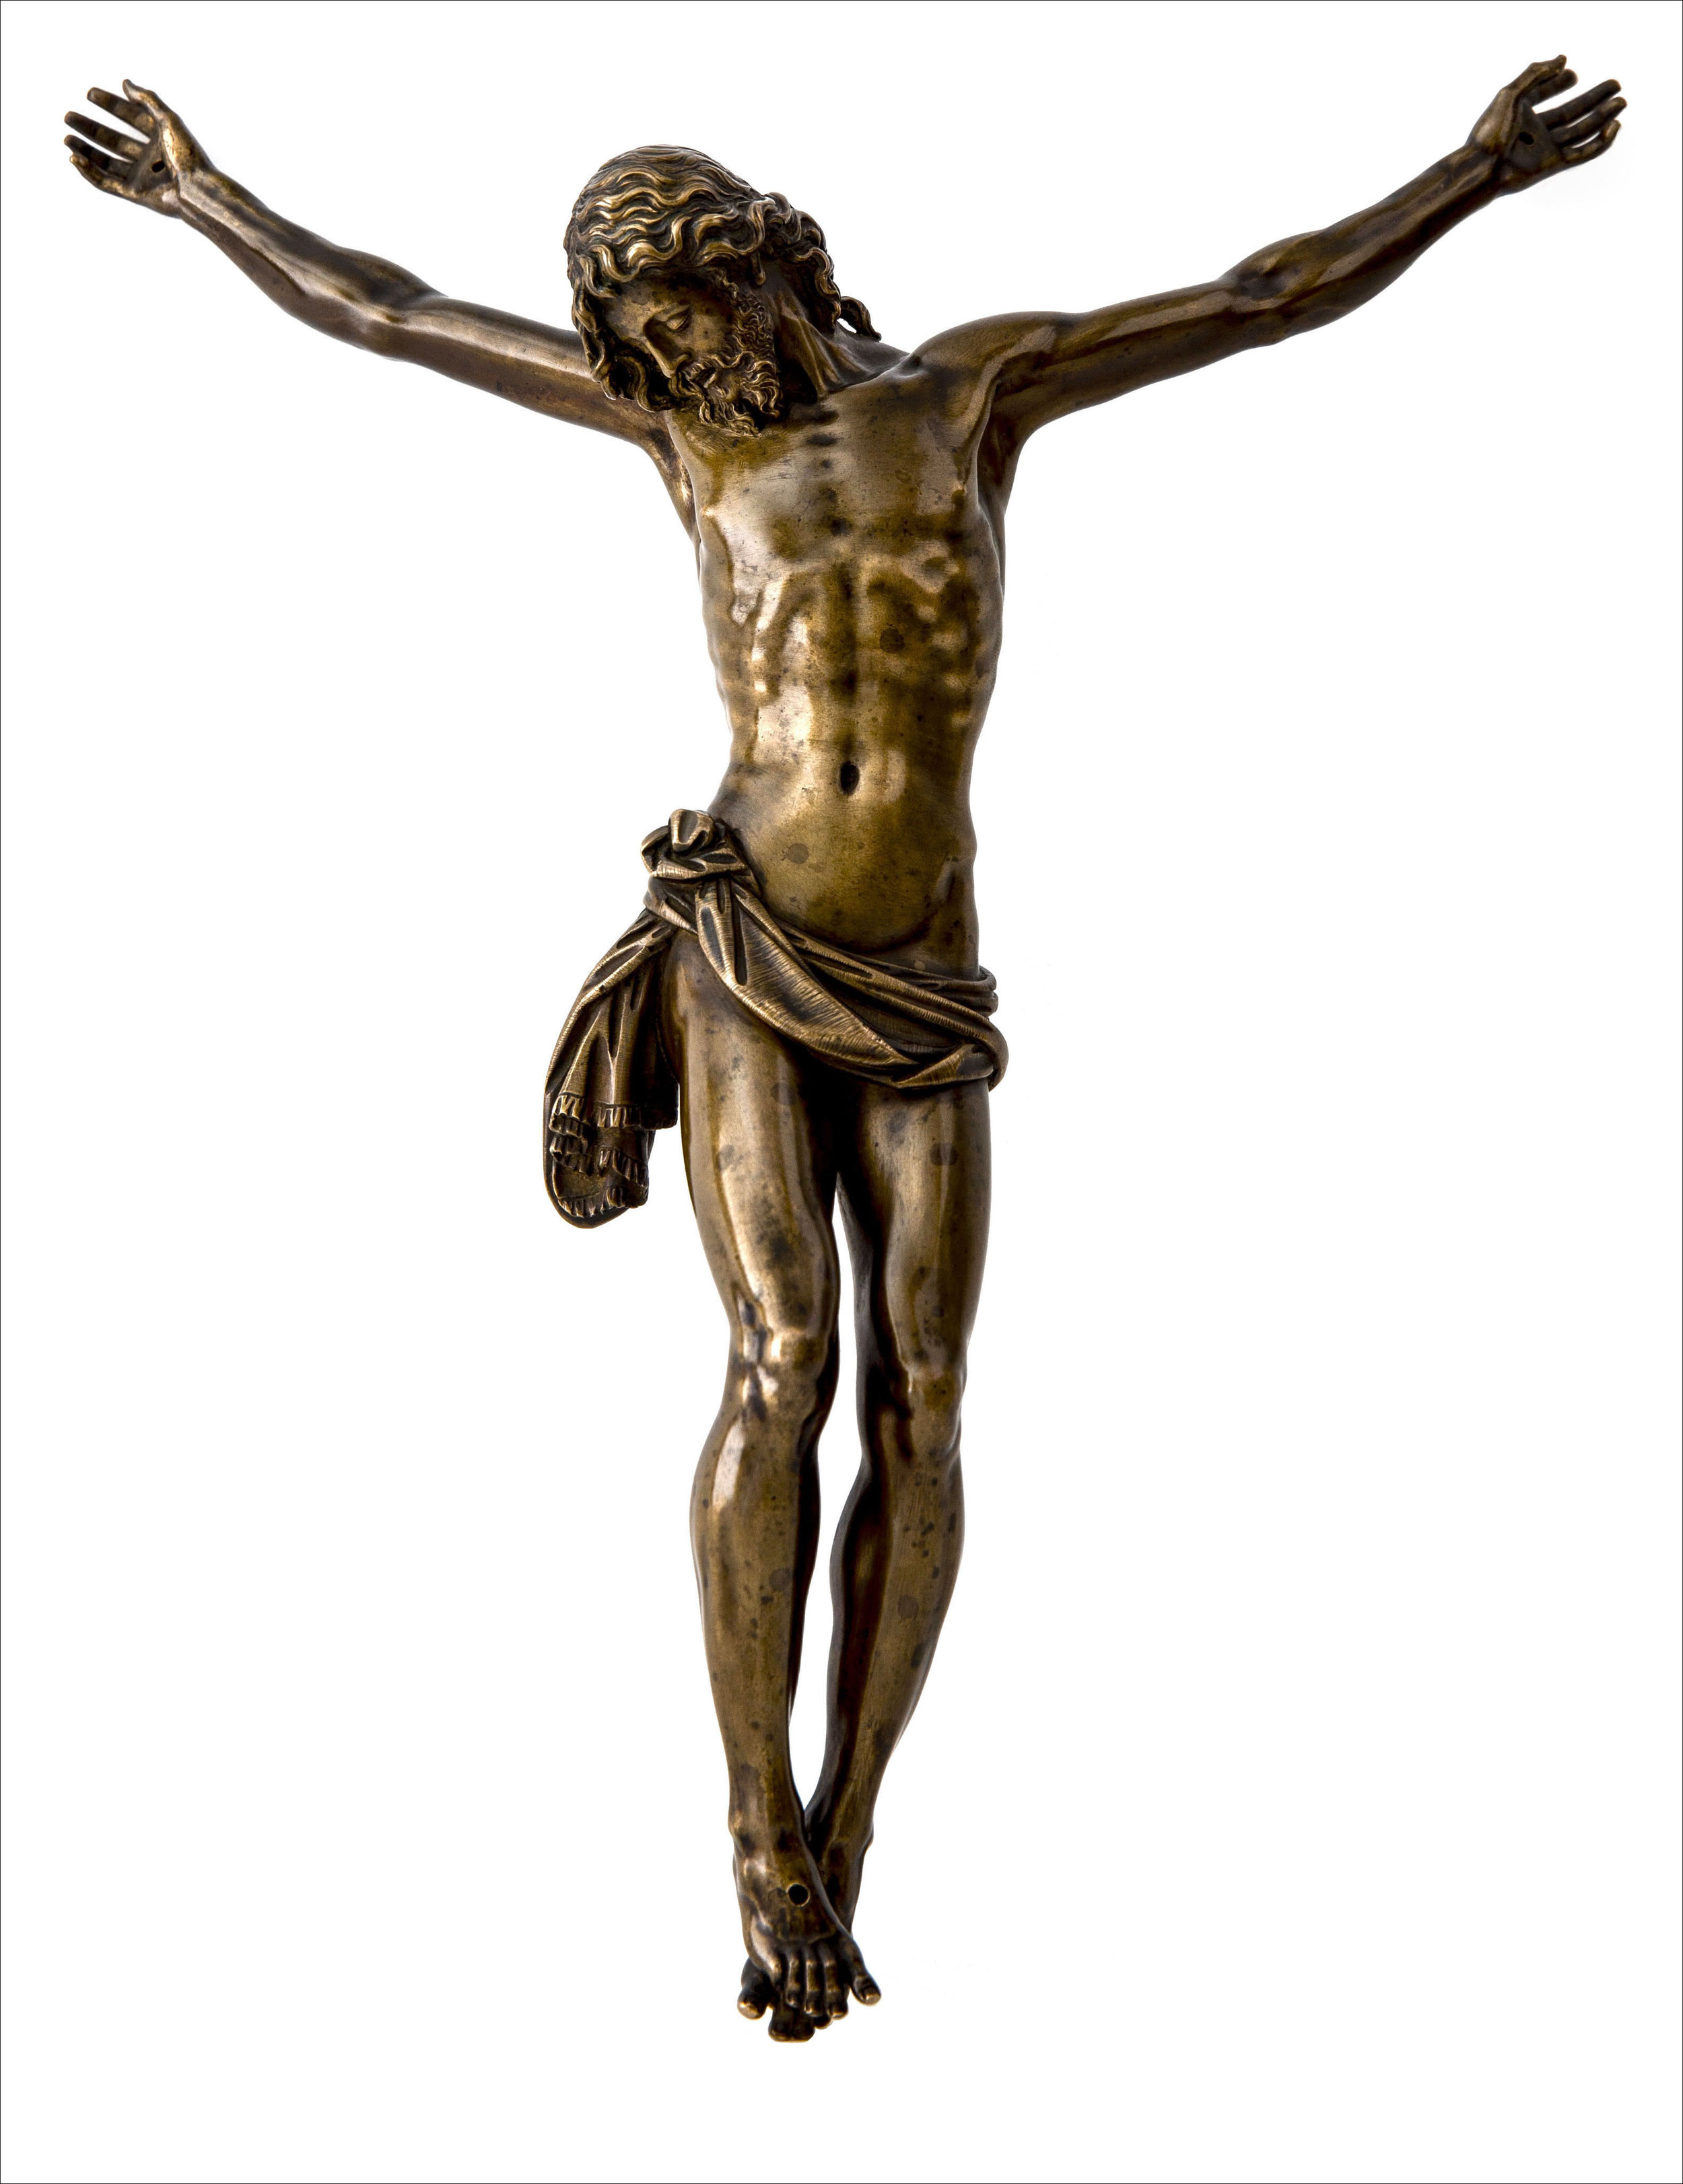 ANTONIO SUSINI  Florence, 1558 - 1624         Cristo Morto   Cast from a model by Giambologna (1529 - 1608), circa 1600        Bronze; on a modern ebony veneered base   31.5 cm. high, 26.5 cm. wide  70 cm. high, overall        Sold to a private collector